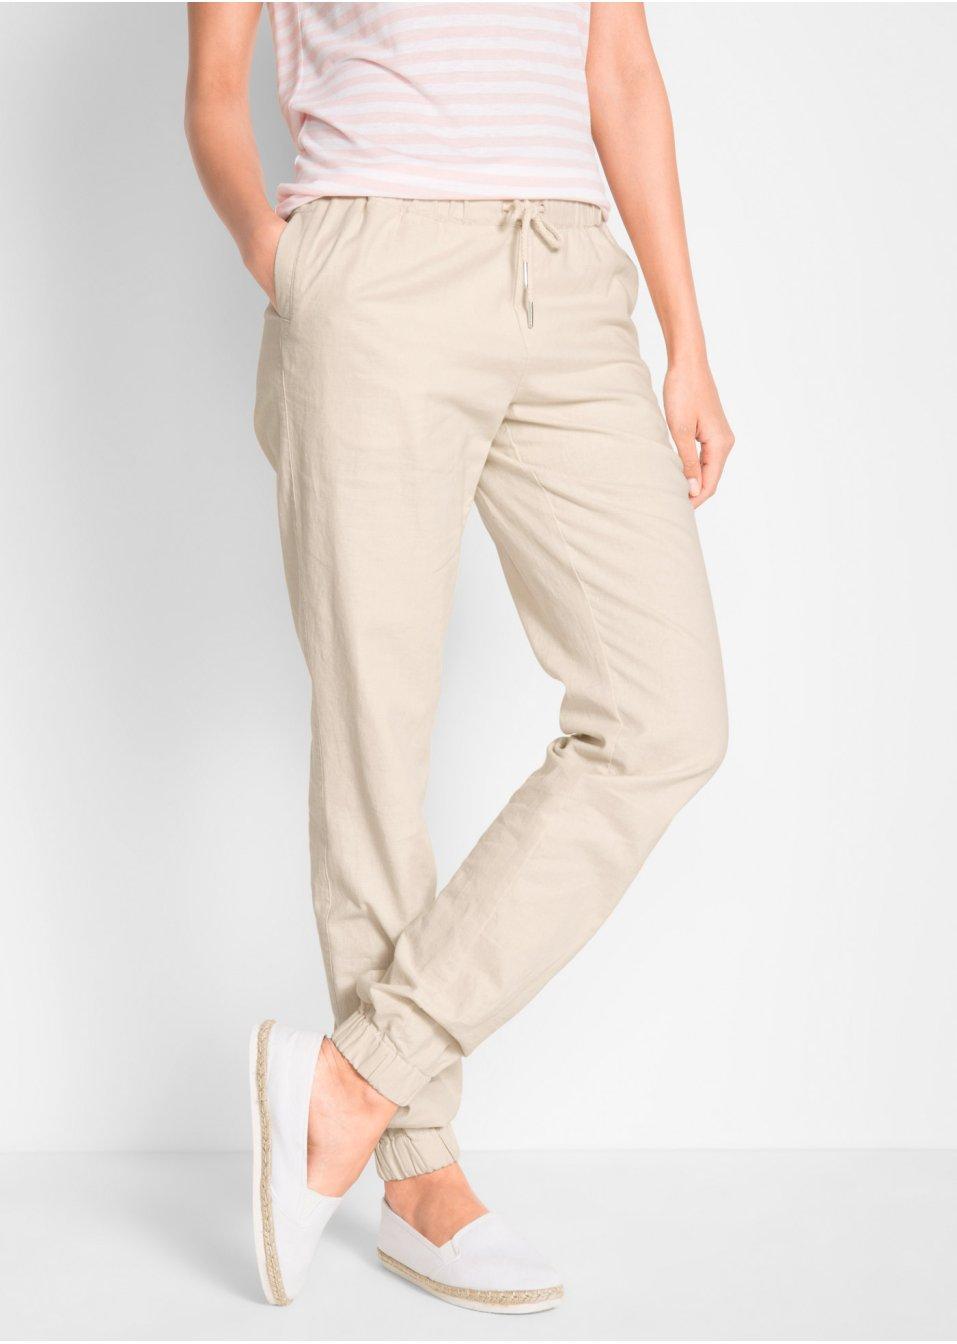 05e7c341edc99 Pantalon en lin beige galet - Femme - bpc bonprix collection - bonprix.fr